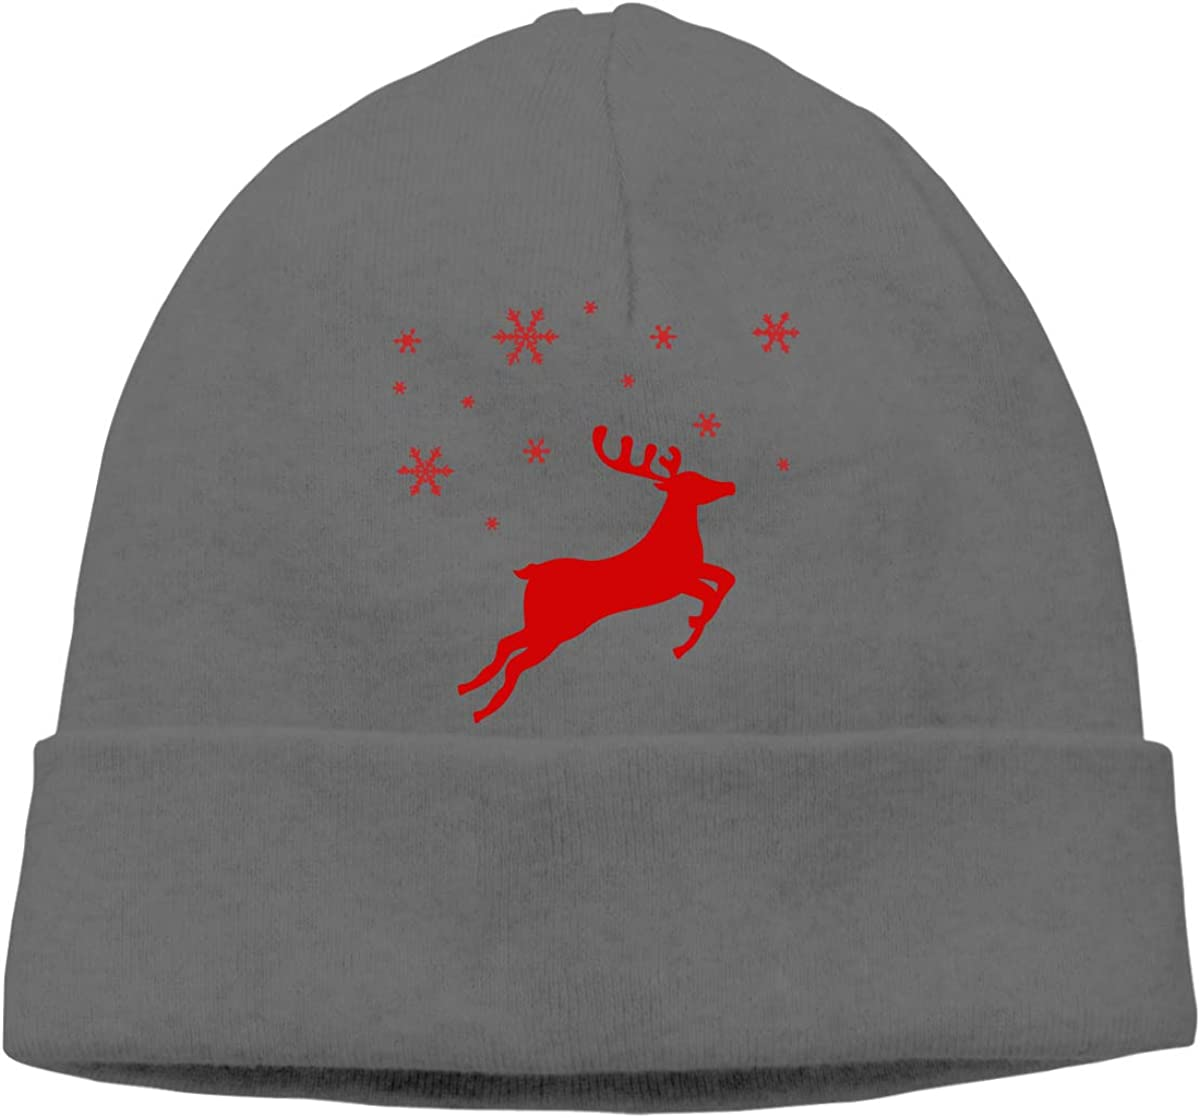 Men//Women Red Reindeer Outdoor Fashion Beanies Hat Soft Winter Skull Caps